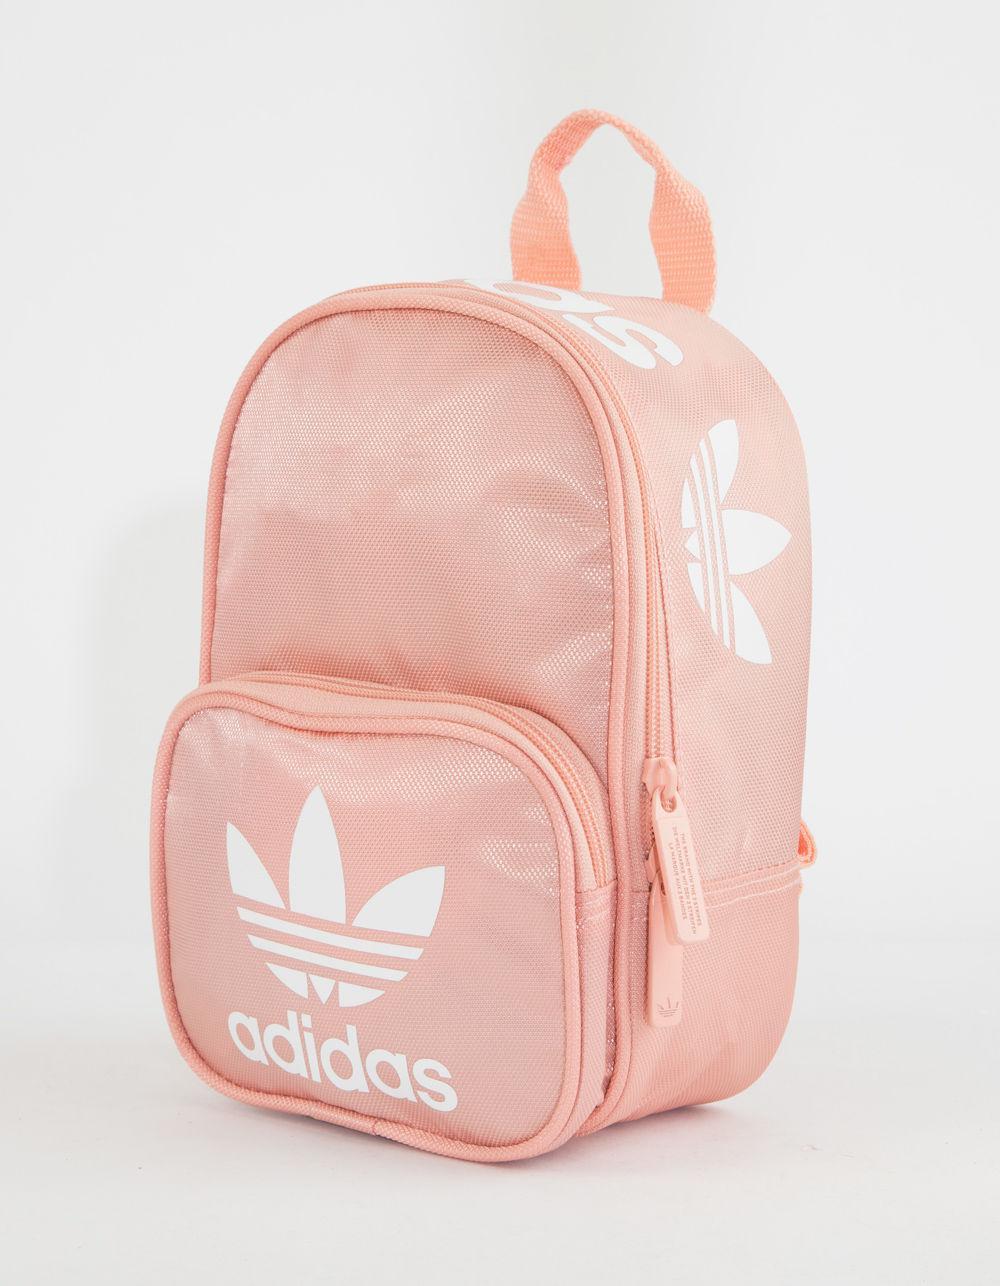 Lyst - adidas Originals Santiago Pink Mini Backpack in Pink f3cb6f9a6e570